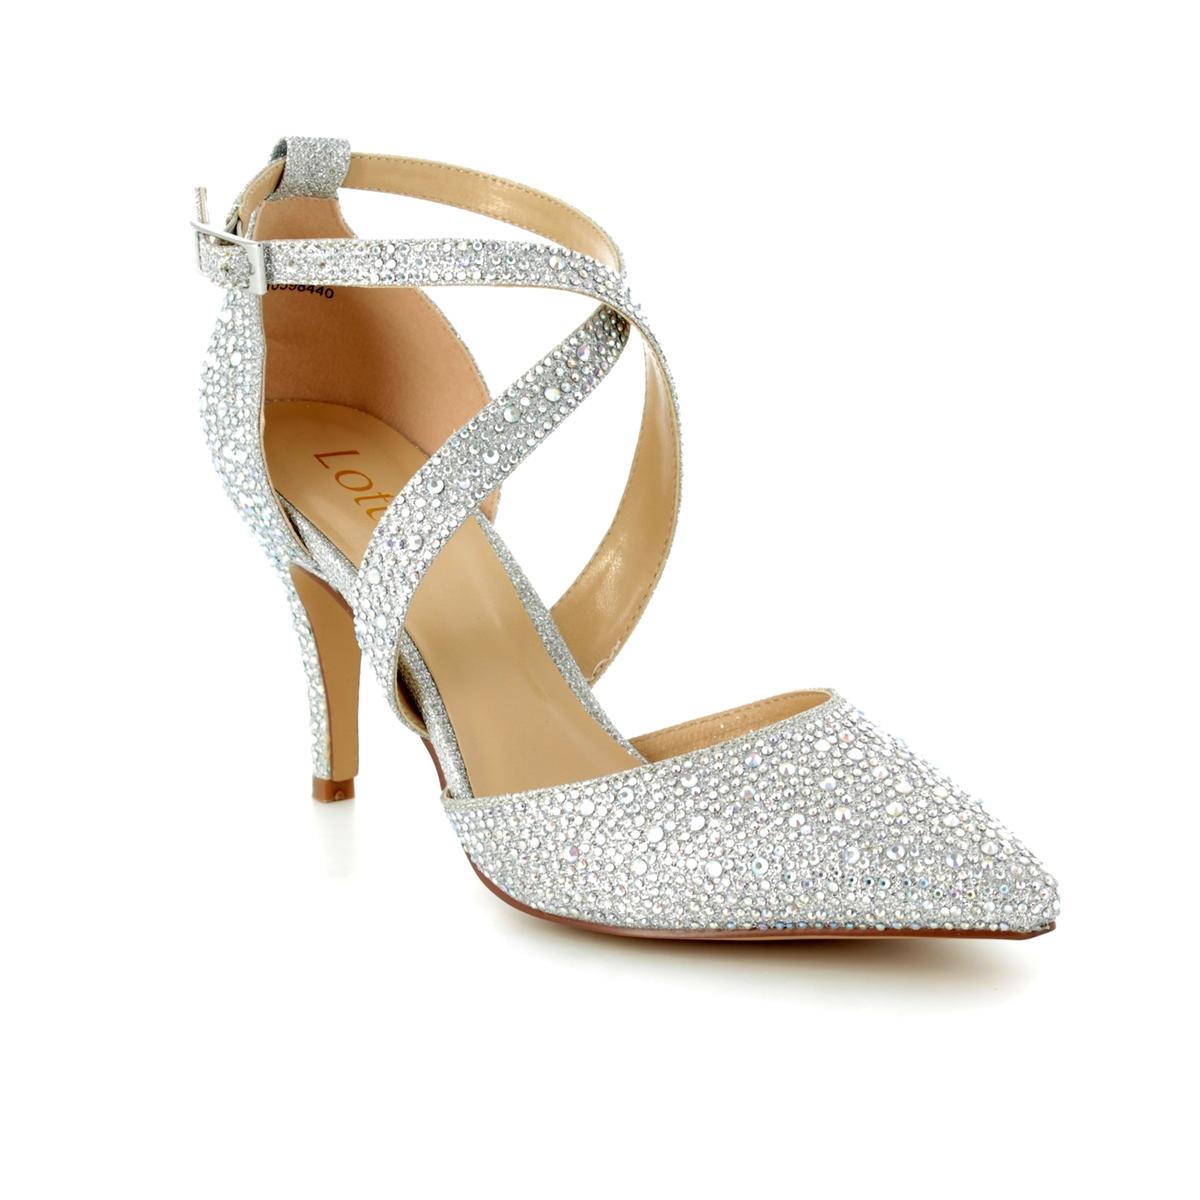 c3dc18e42e5 Lotus High-heeled Shoes - Silver Glitz - 50911 01 STAR